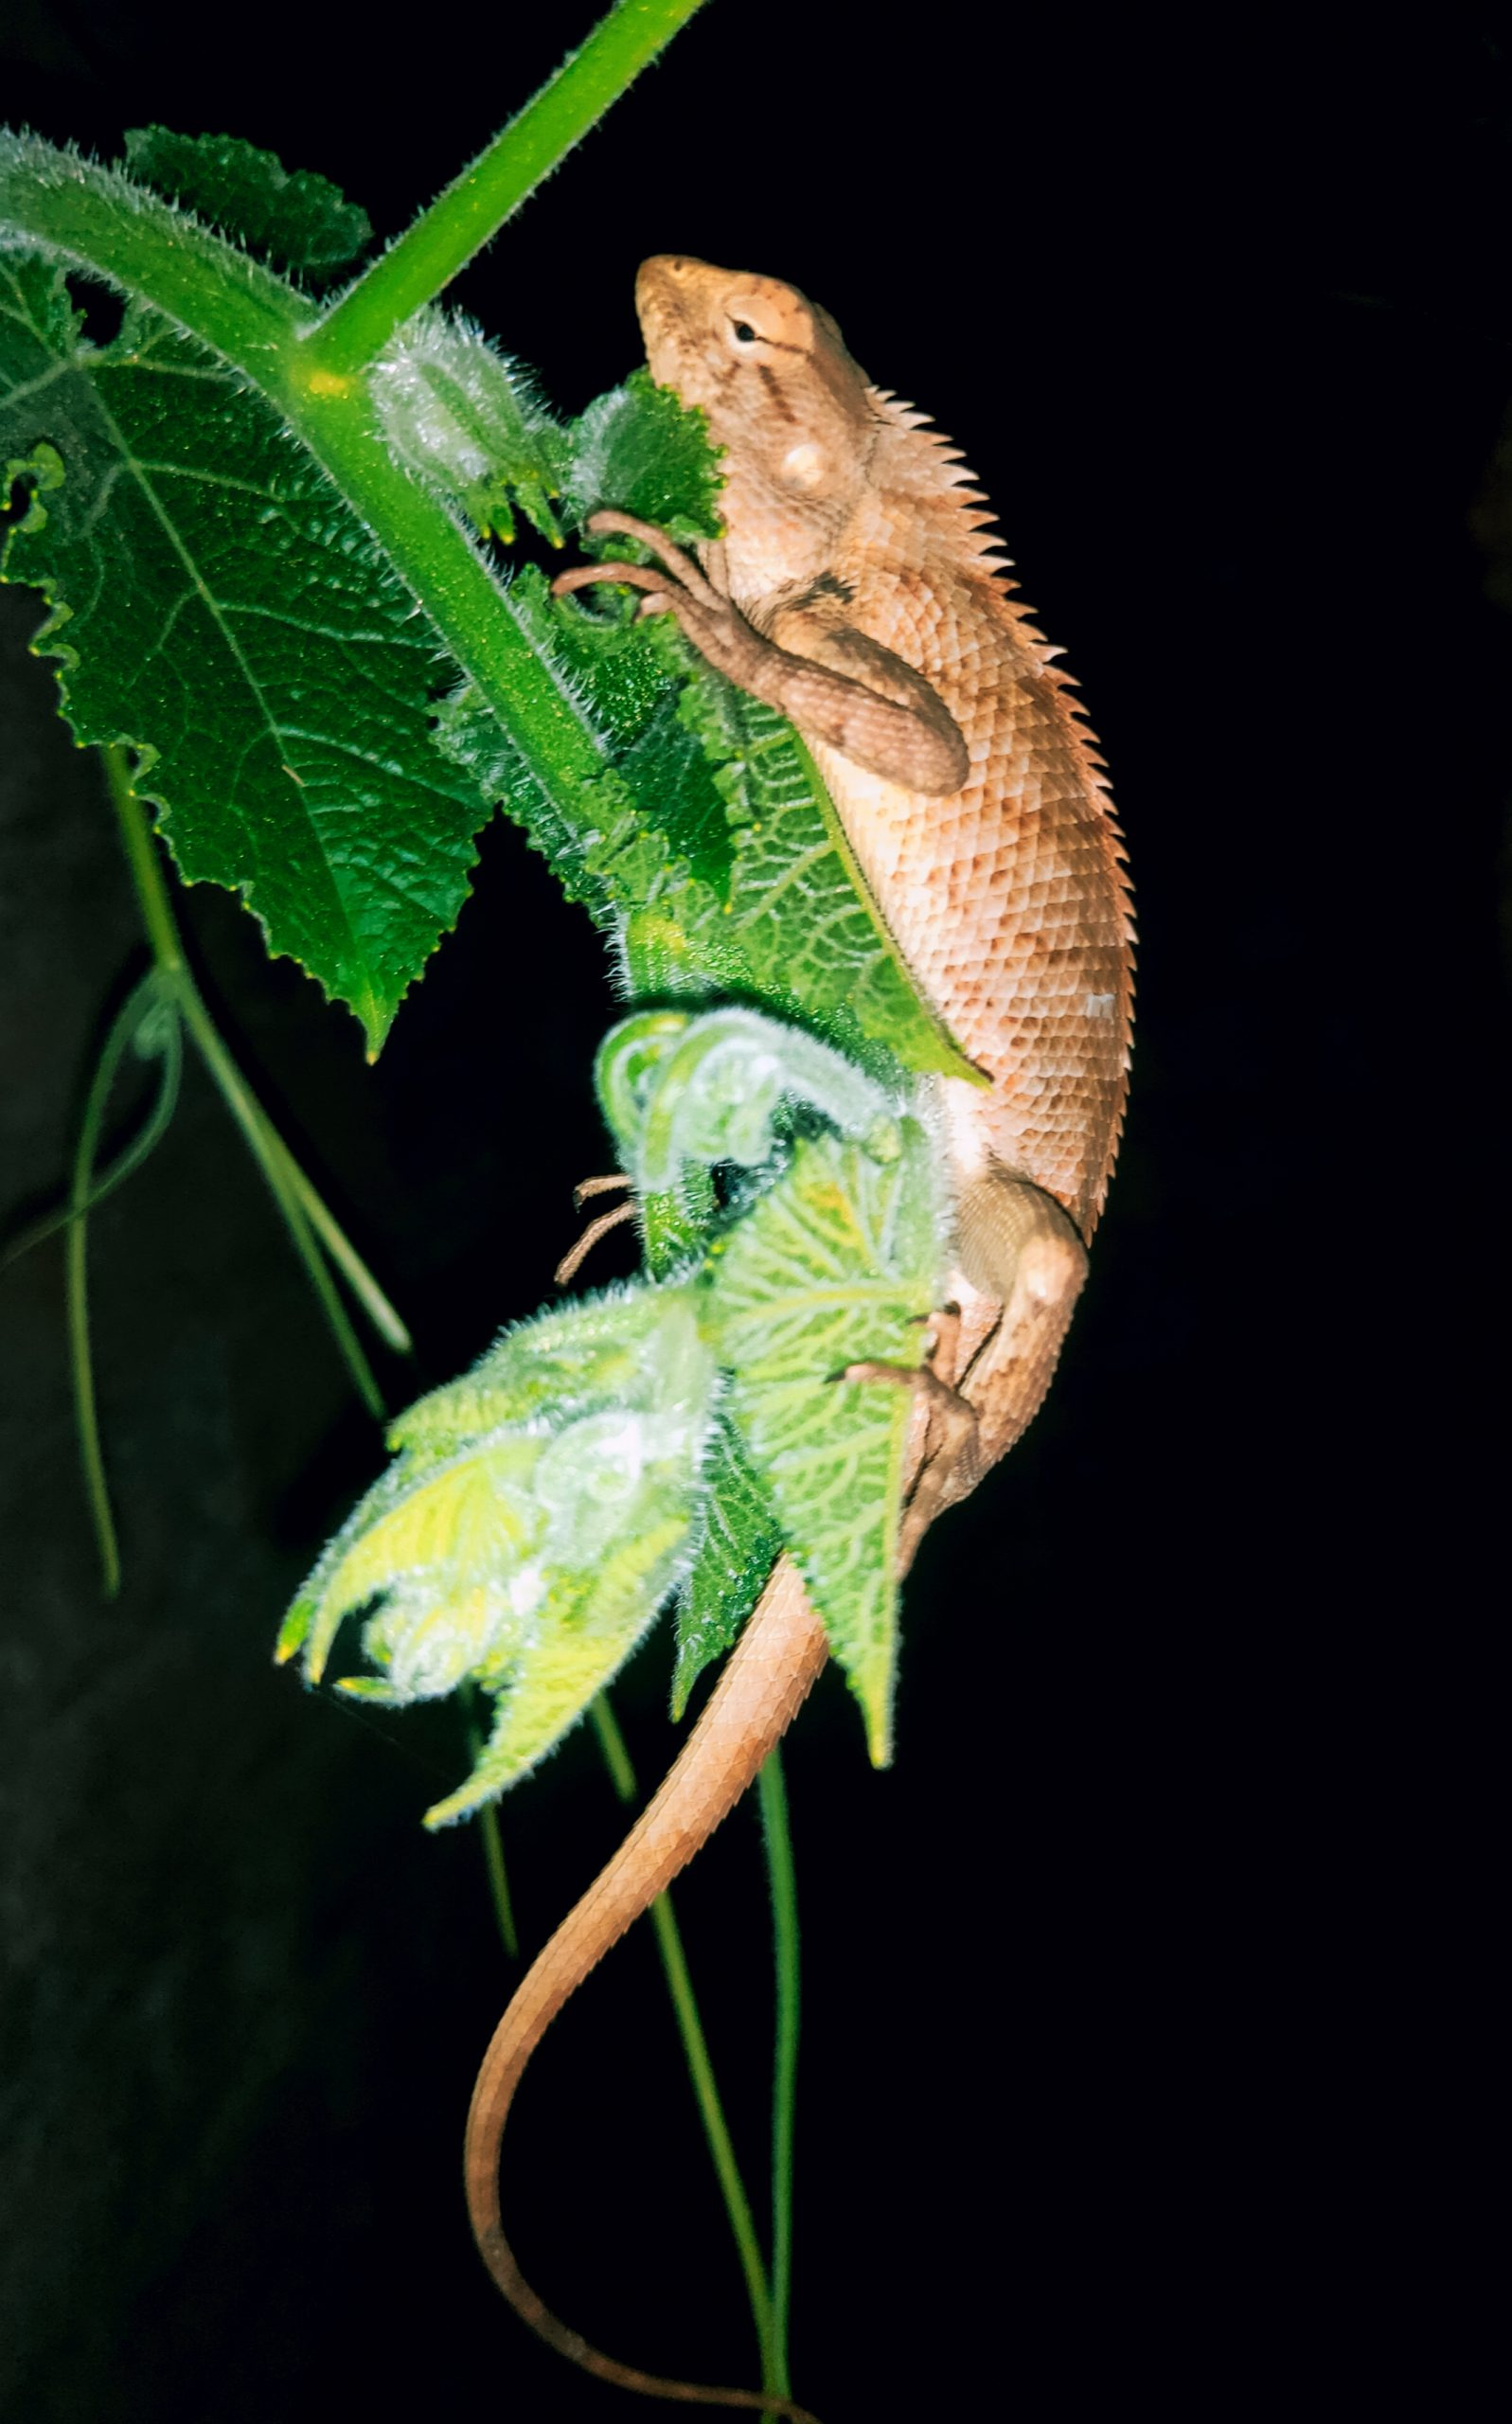 A chameleon on a vine plant